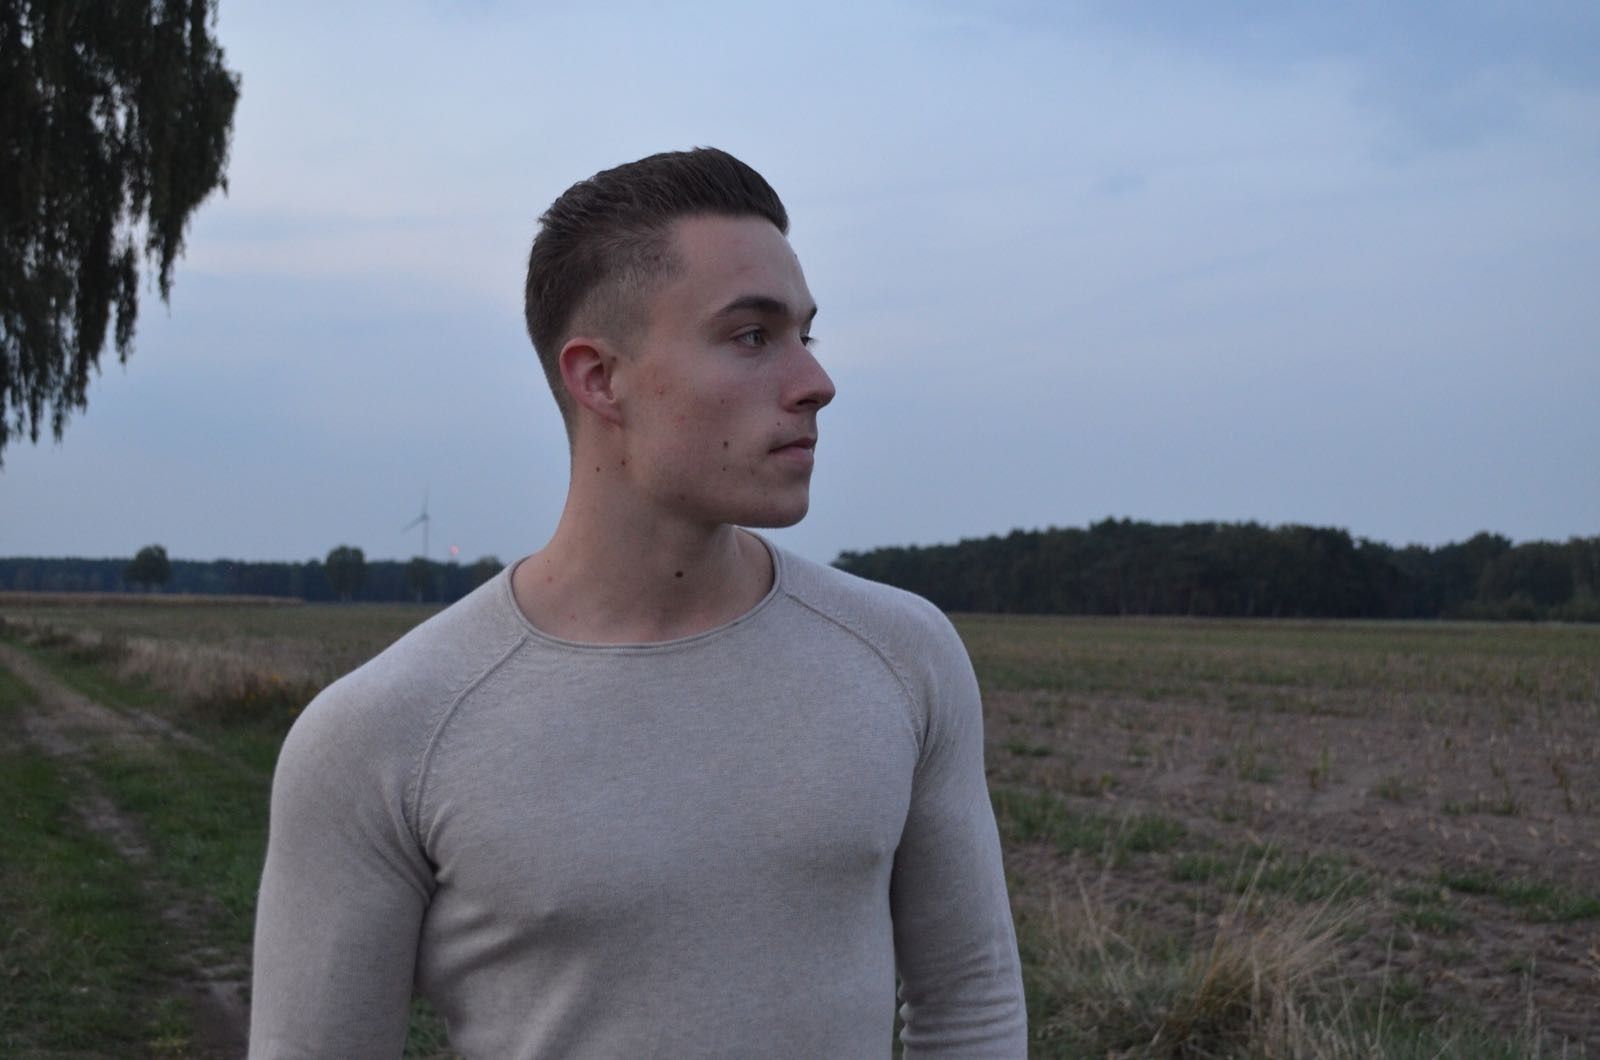 niederlandischen jungen wunderschonen korper im freien